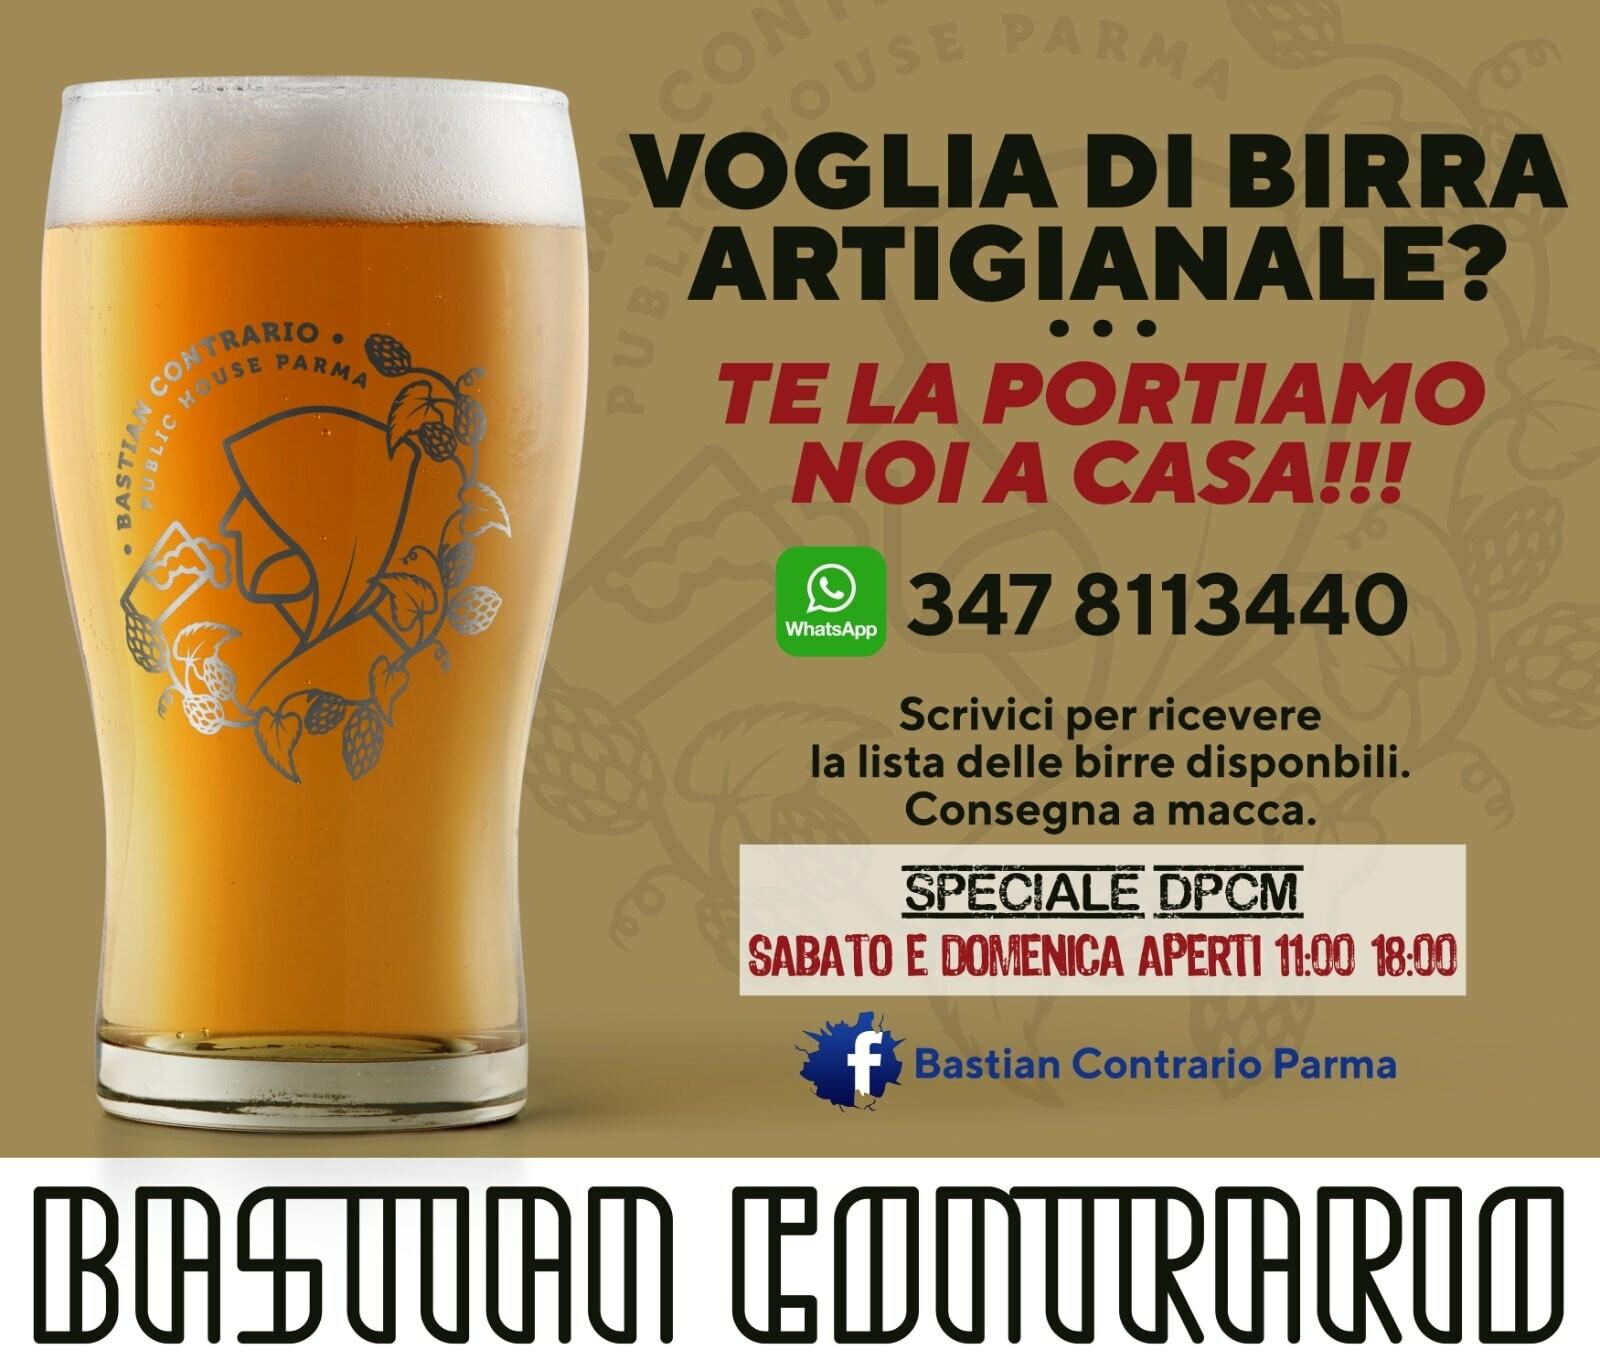 Bastian Contrario: apertura straordinaria sabato e domenica